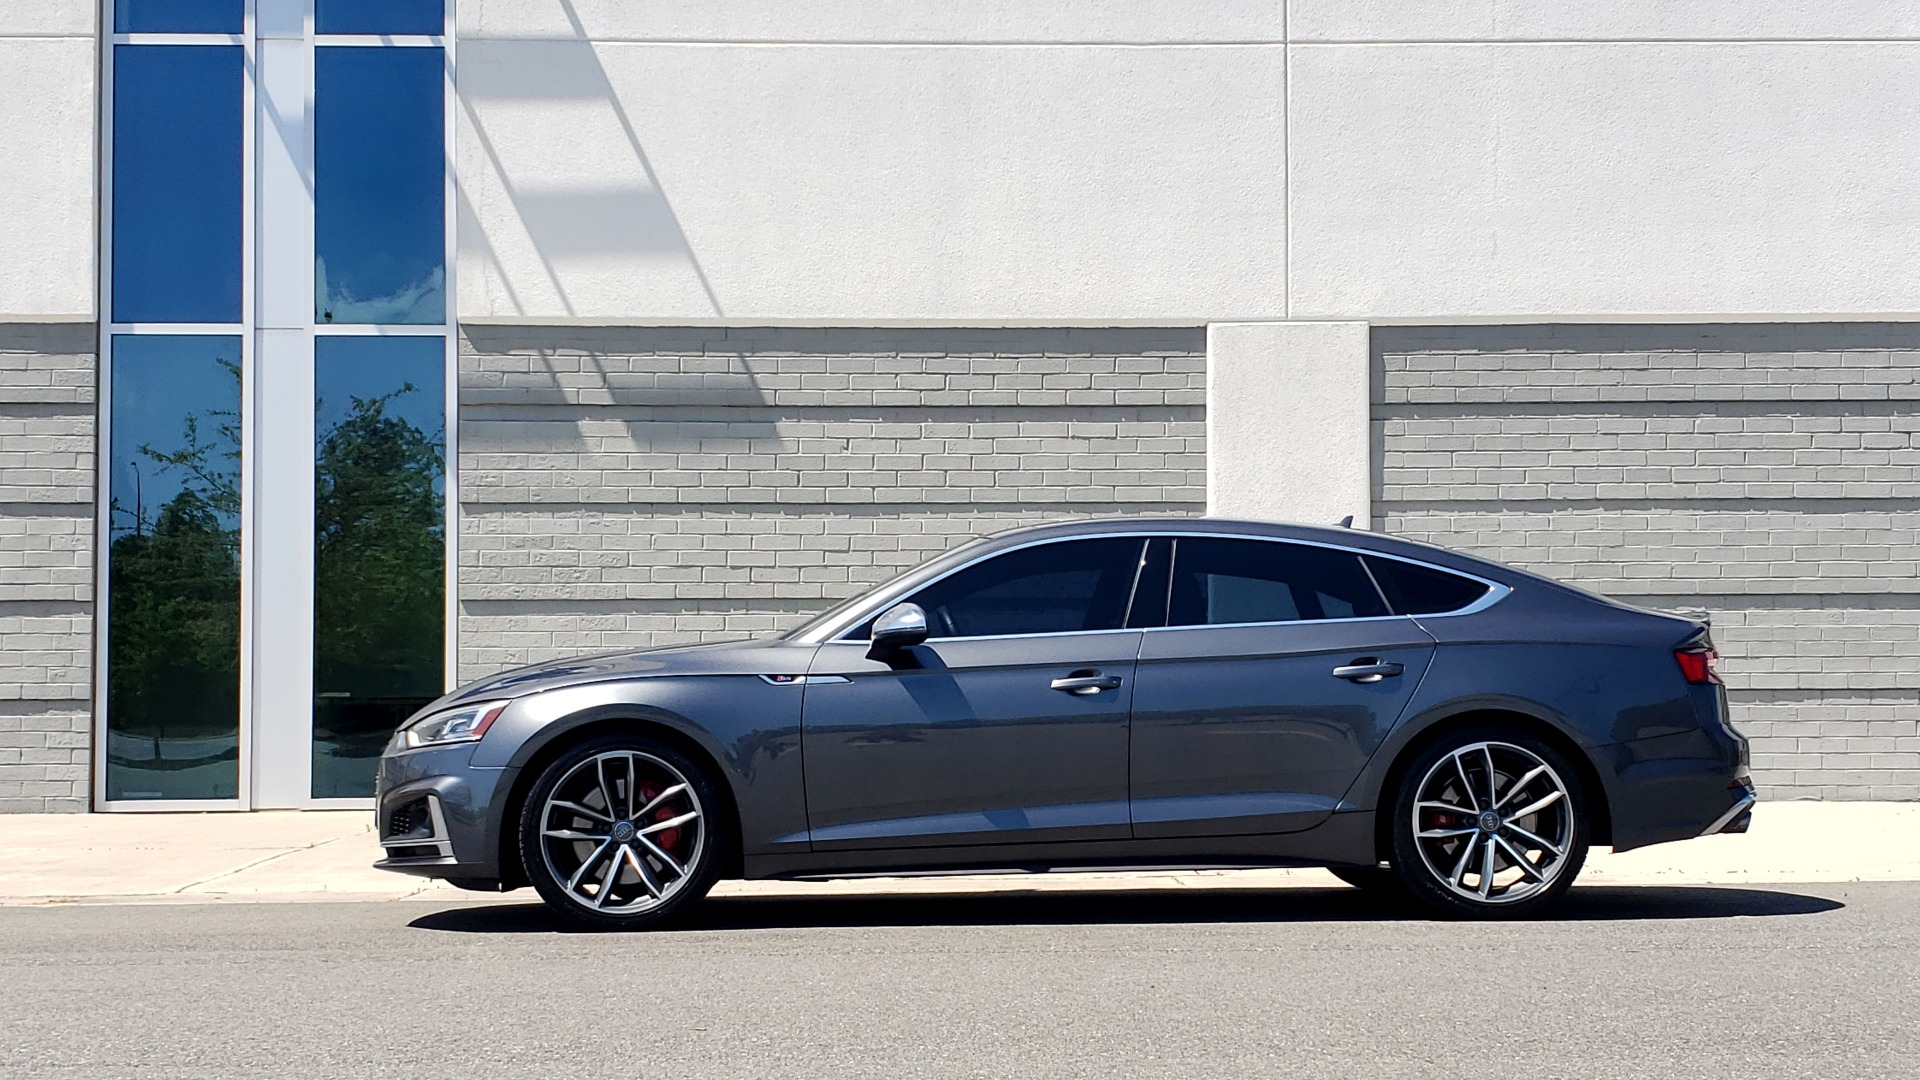 Used 2018 Audi S5 SPORTBACK PRESTIGE S-SPORT / NAV / SUNROOF / HUD / B&O SND / REARVIEW for sale $48,995 at Formula Imports in Charlotte NC 28227 4